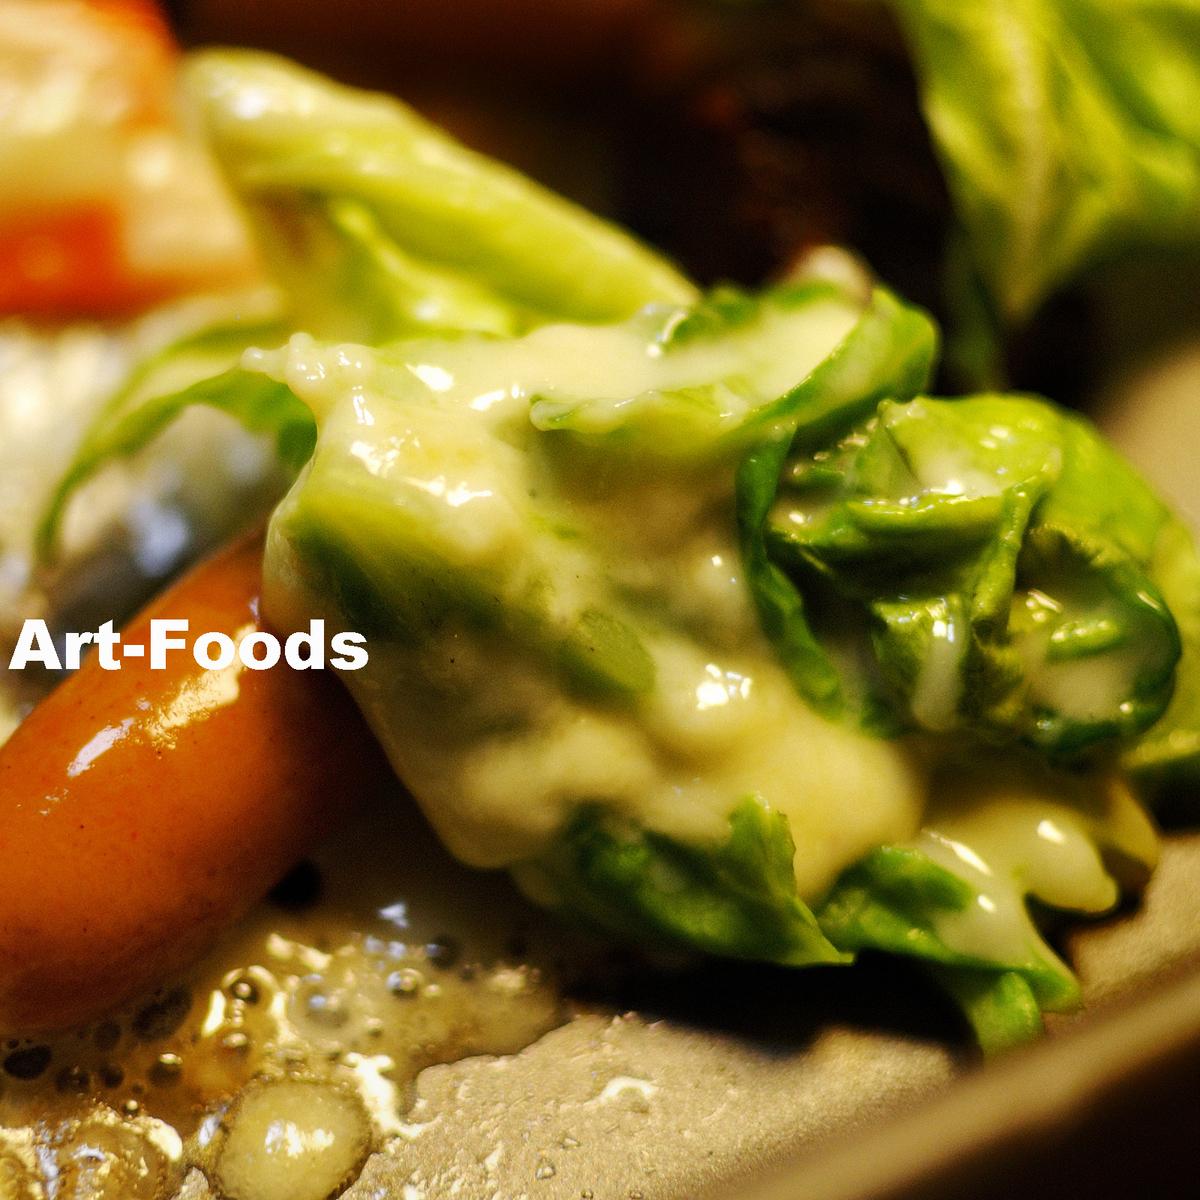 f:id:artfoods:20210403043312j:image:w640